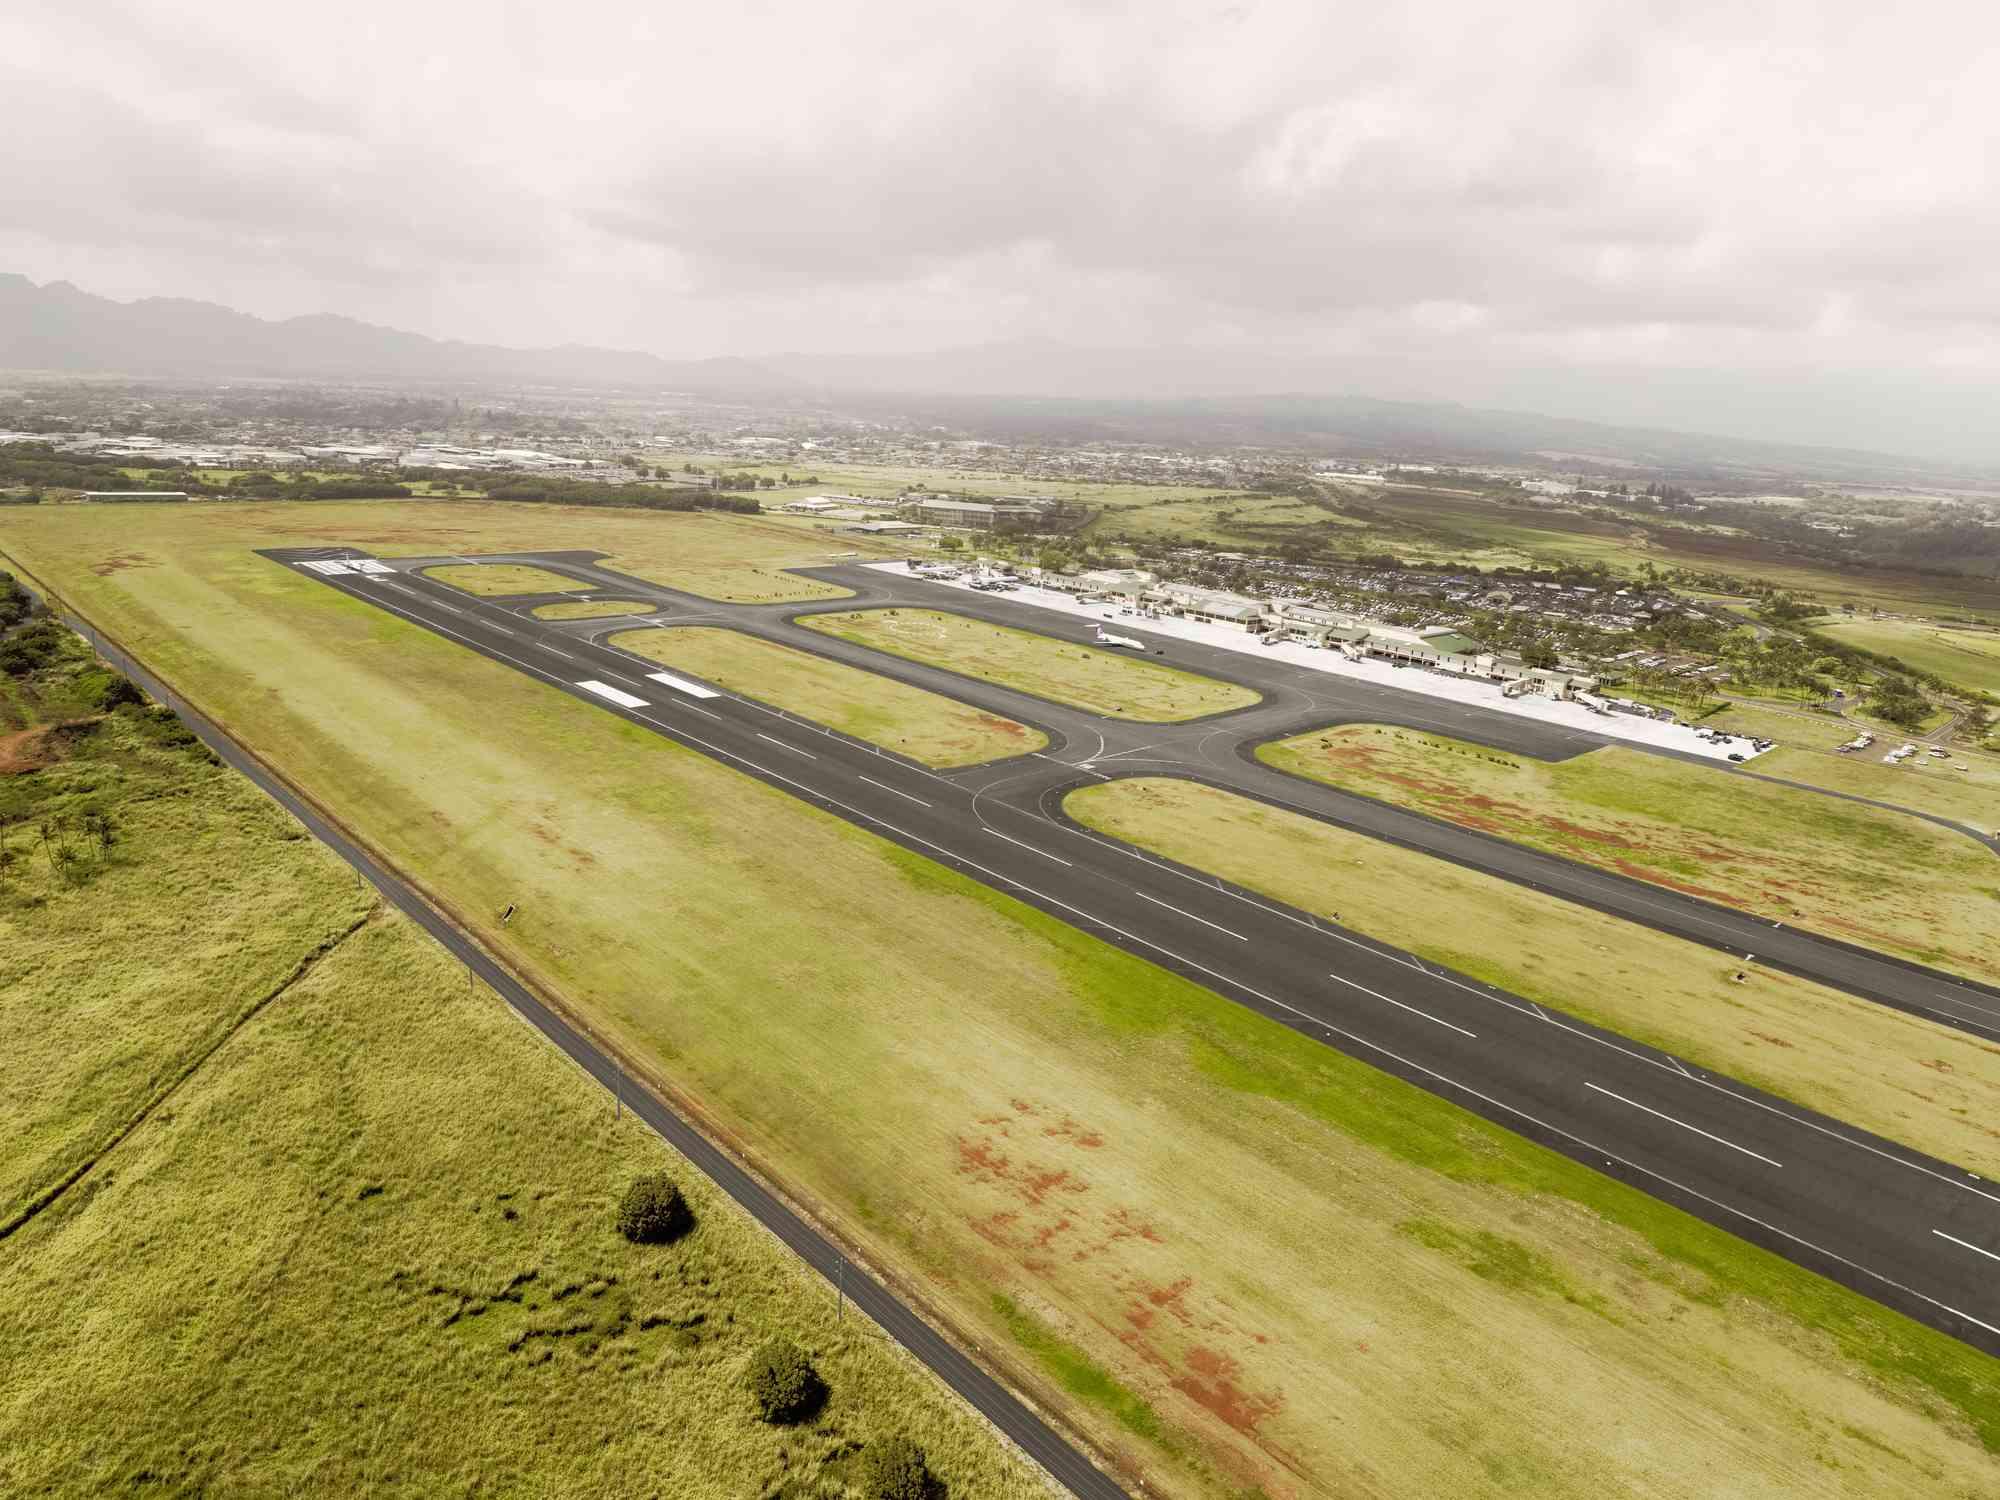 Aerial view of Hilo International Airport Runway, Hawaii